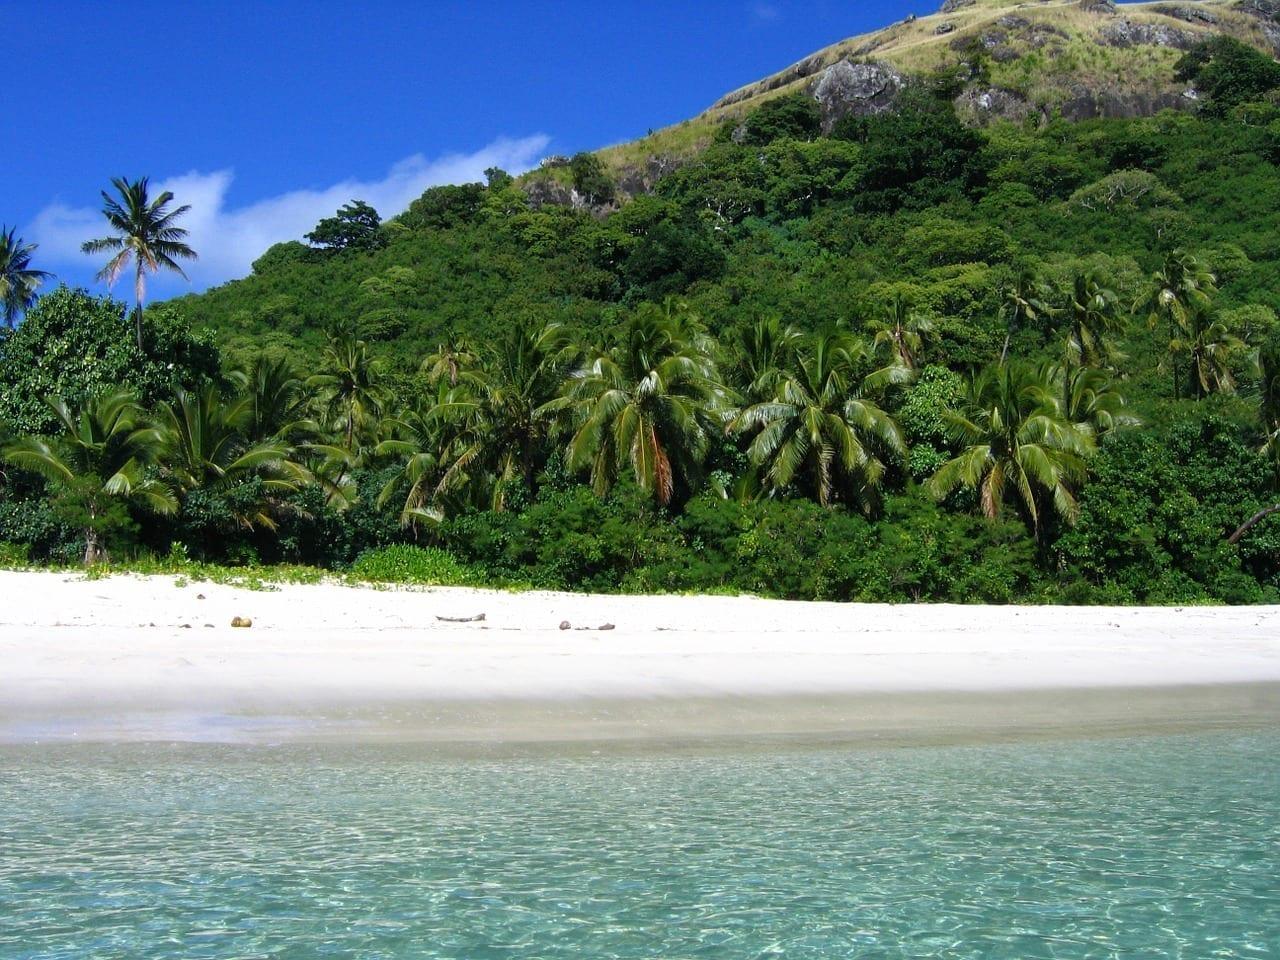 Fiji Playa Tropicales Fiyi